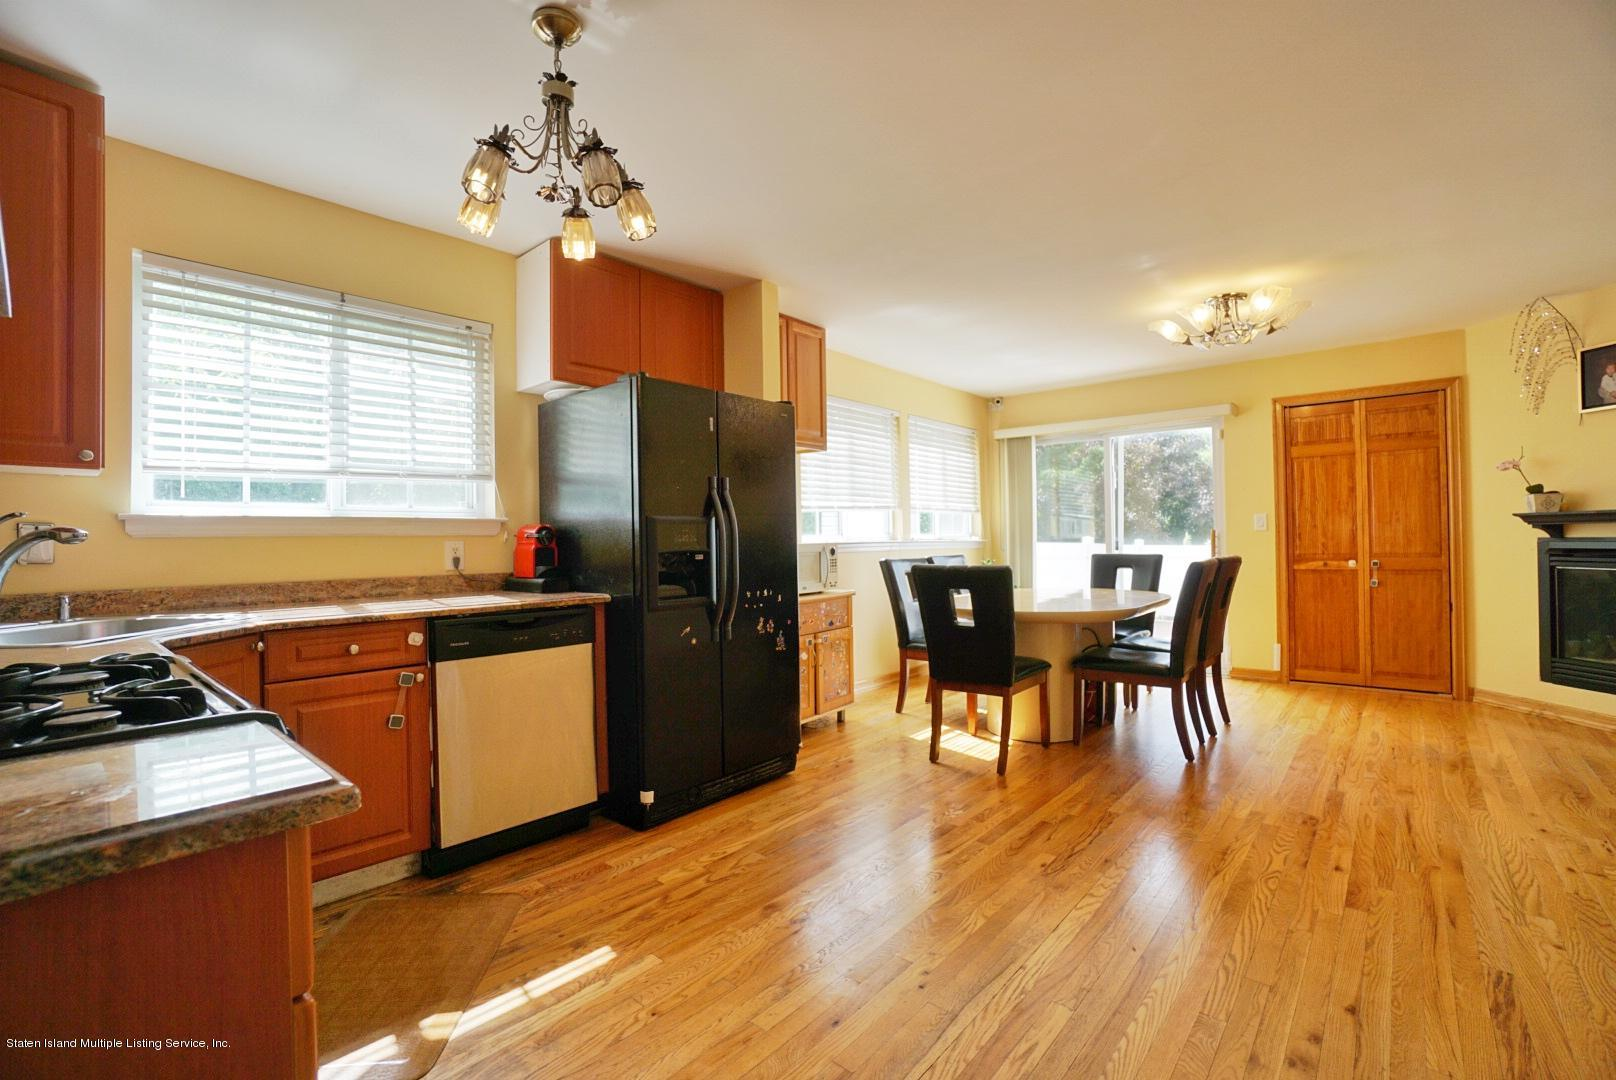 Single Family - Semi-Attached 36 Zwicky Avenue  Staten Island, NY 10306, MLS-1131911-4